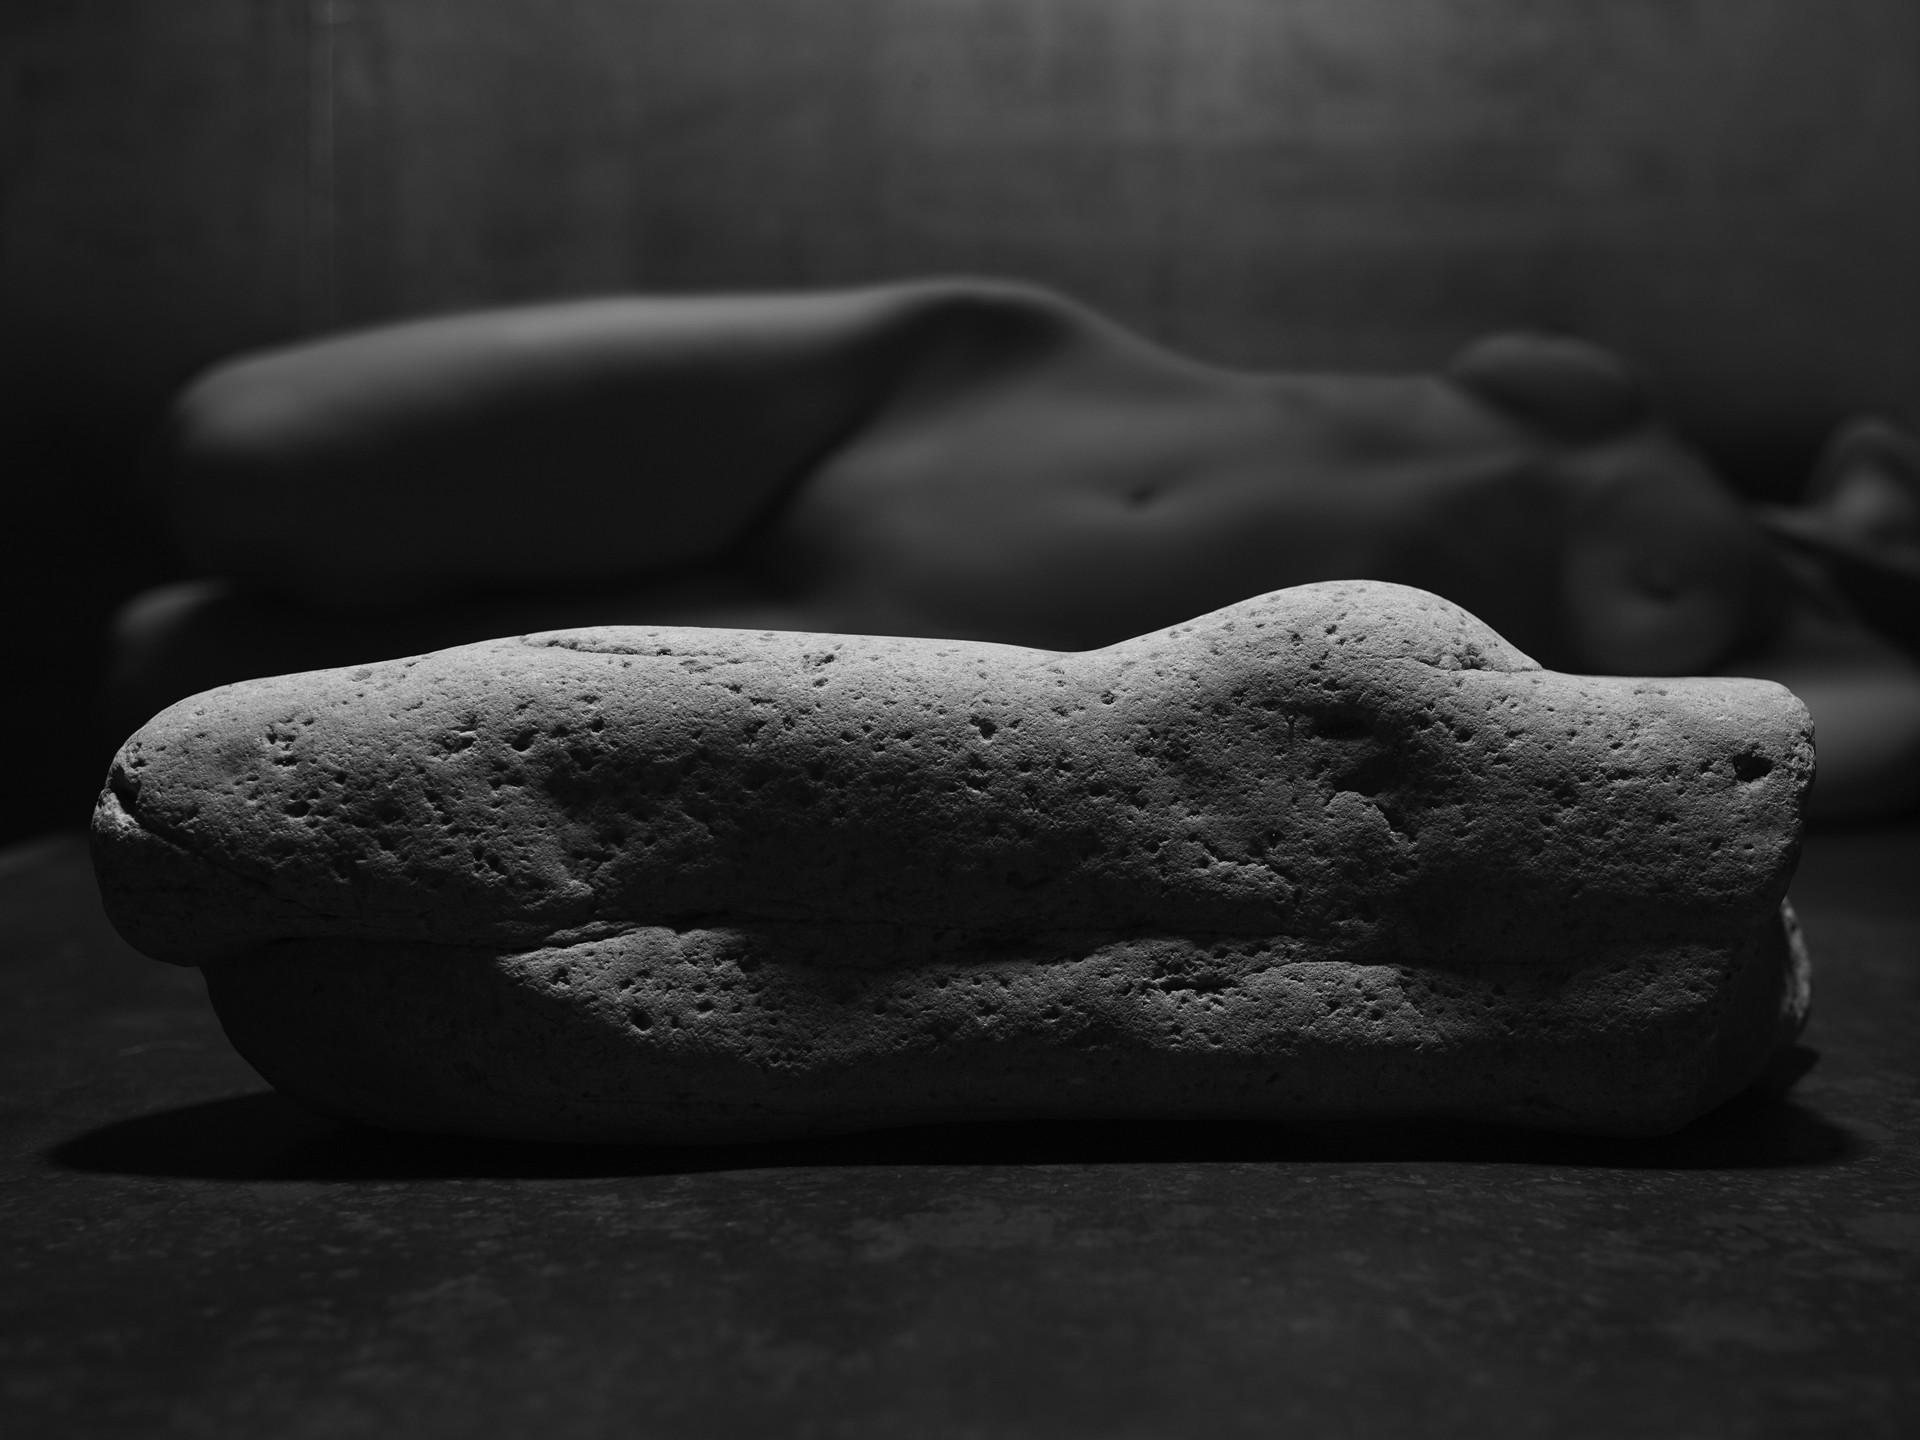 Horizontal Torso by Frank Sherwood White